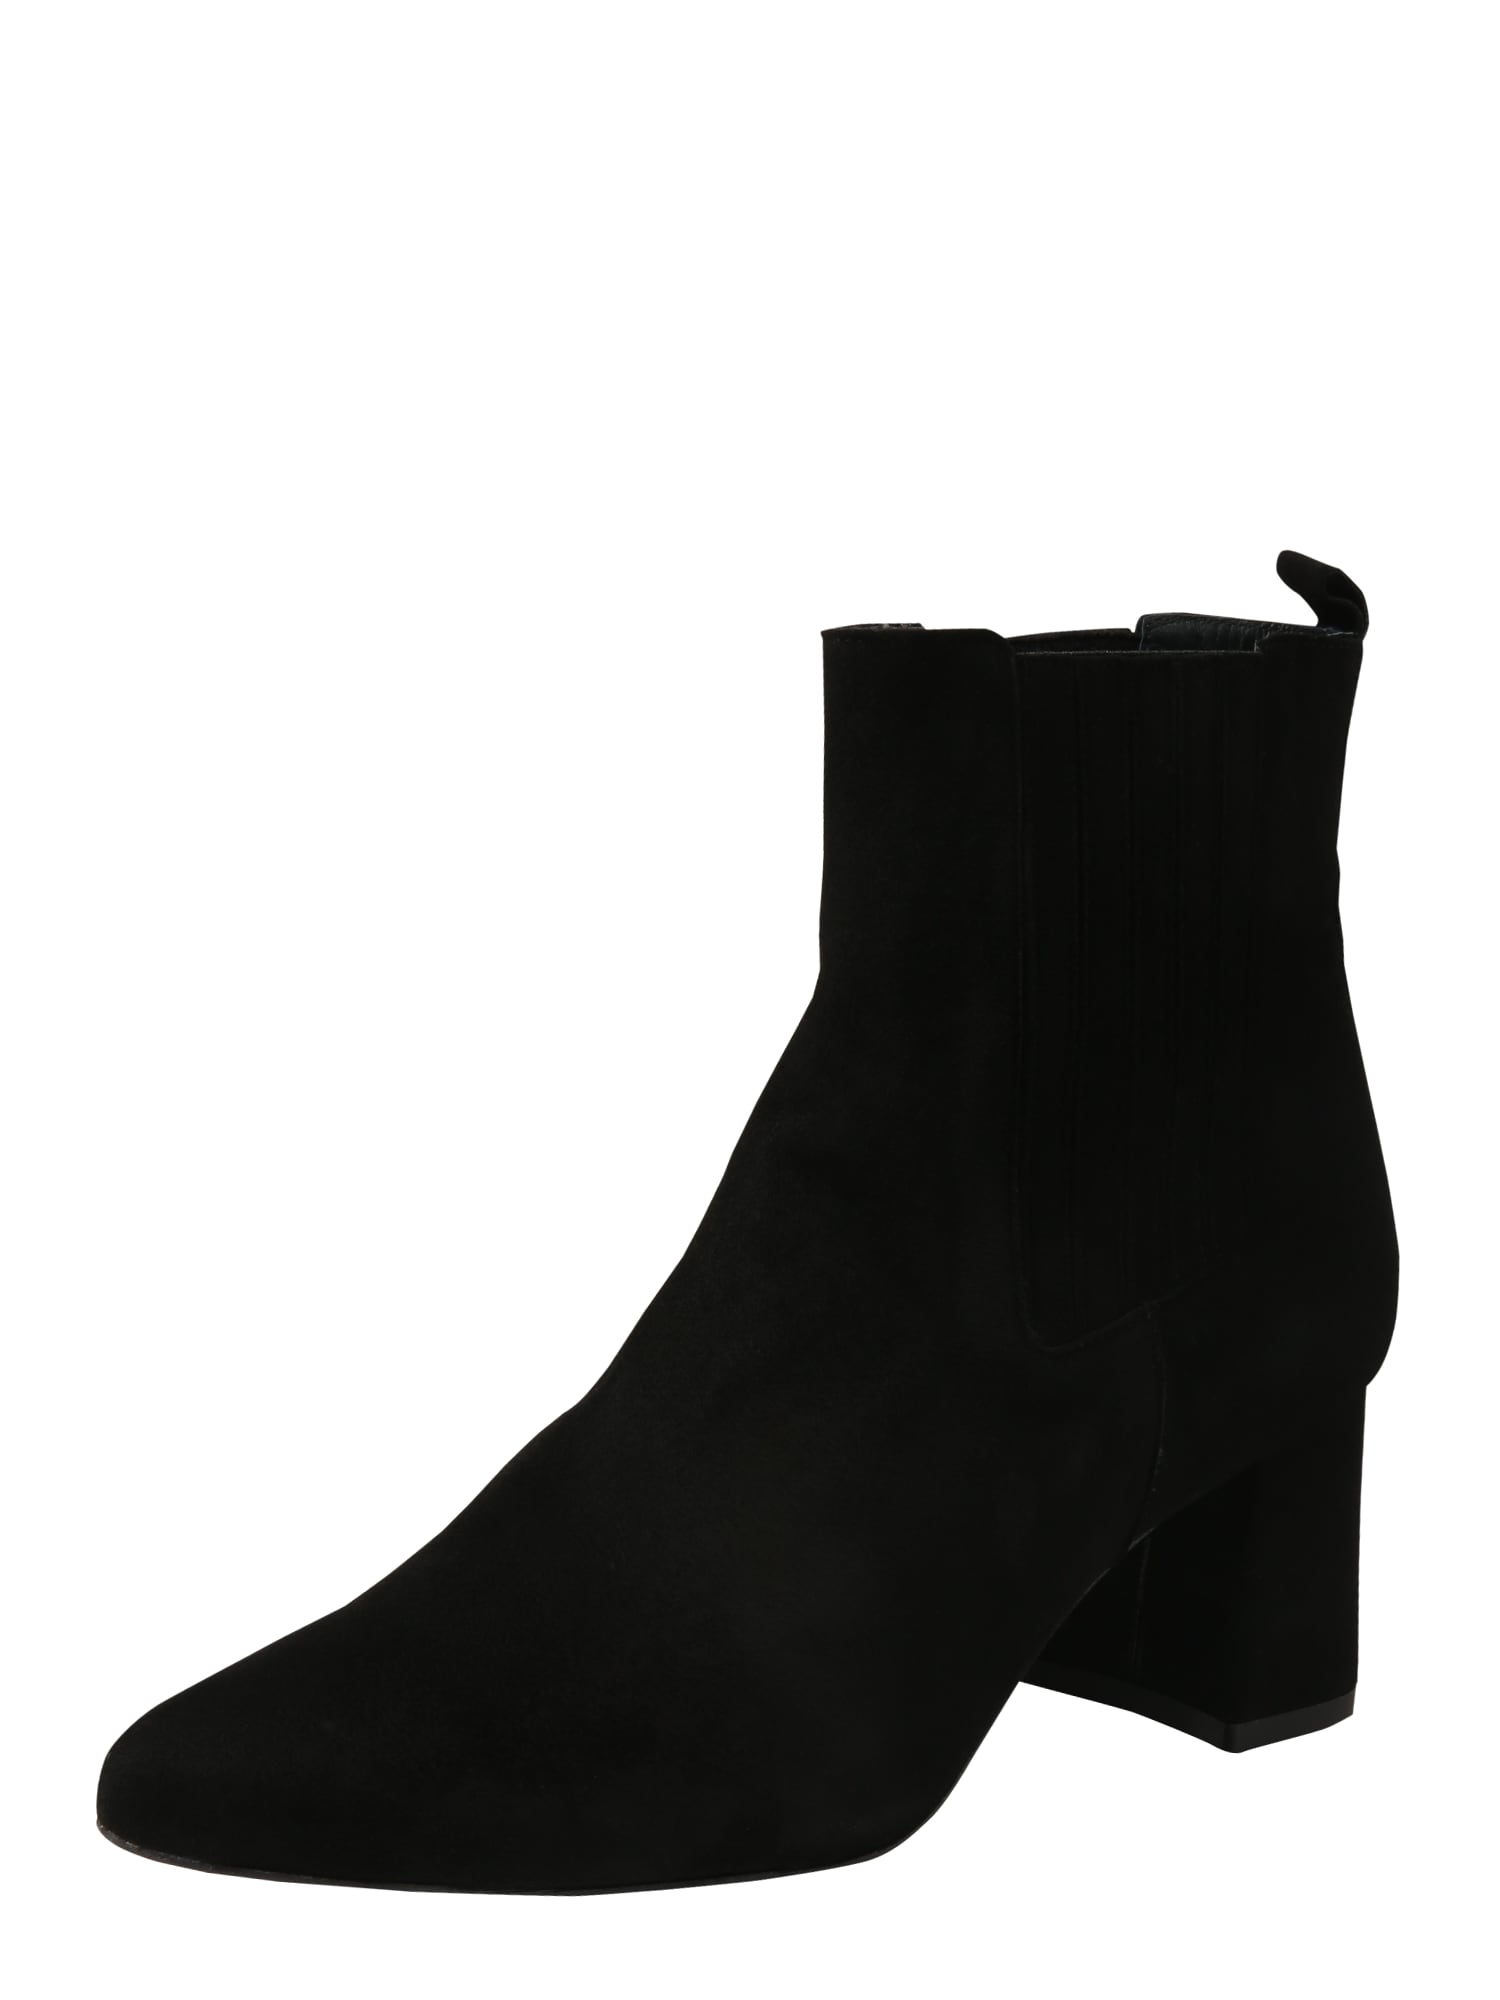 Apple of Eden Kulkšnis dengiantys batai 'Carmen' juoda